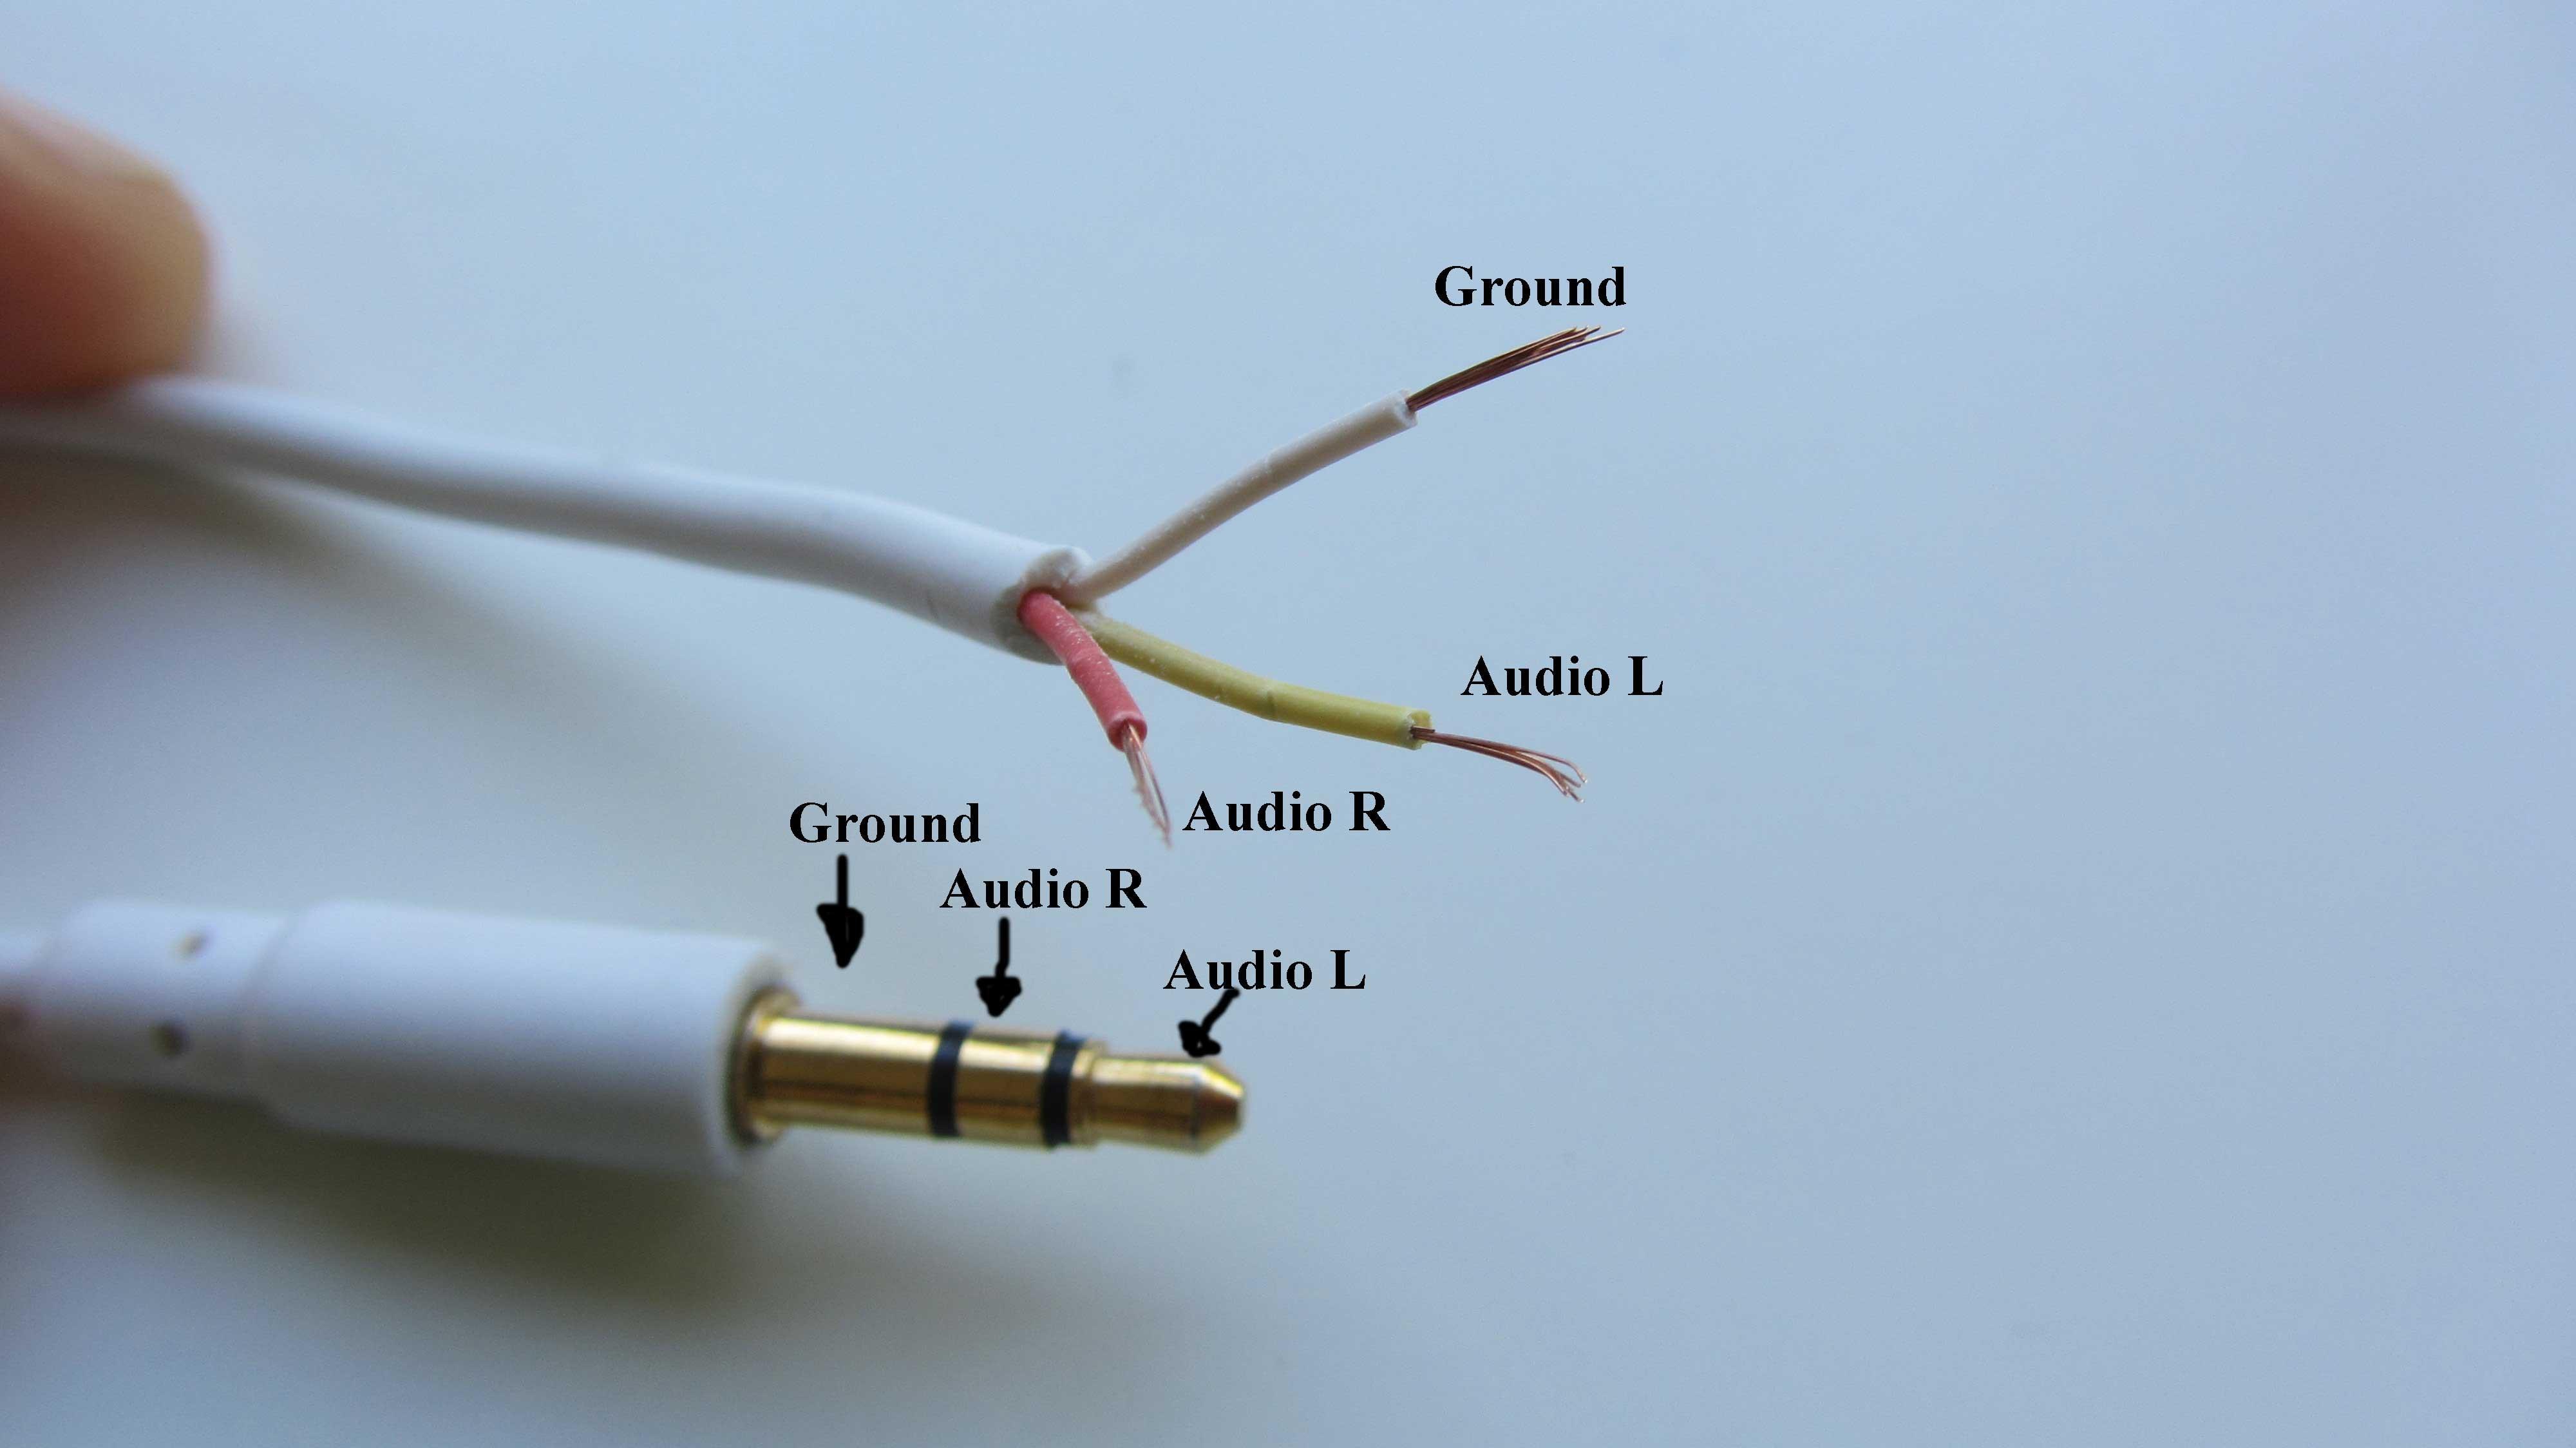 mono cable wiring diagram 1985 corvette fuel pump usb to rca connector manual e books 3 5mm jack schematic diagramjack slpice